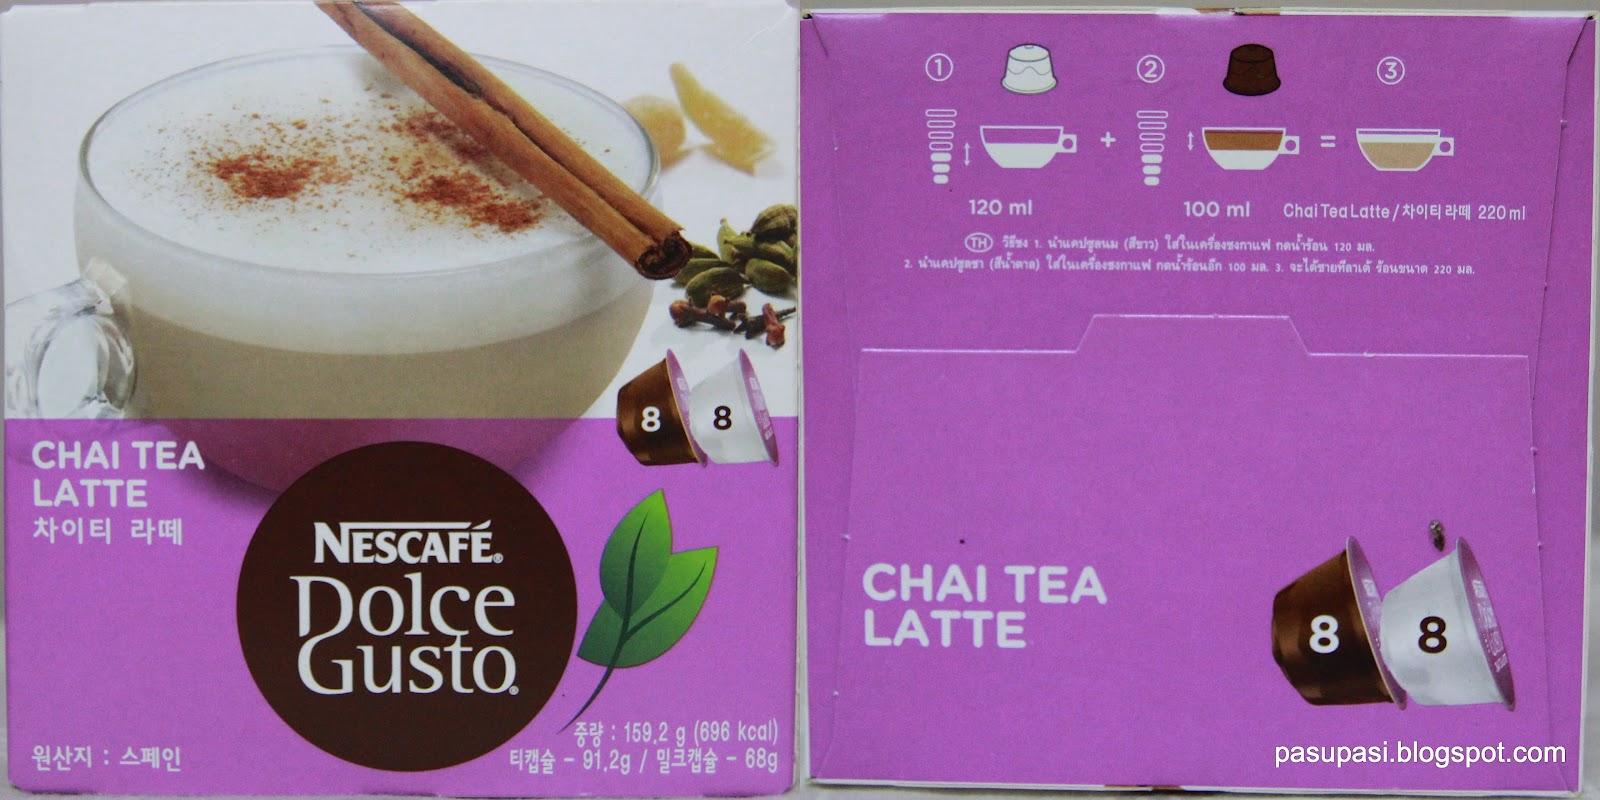 Chai tea latte dolce gusto